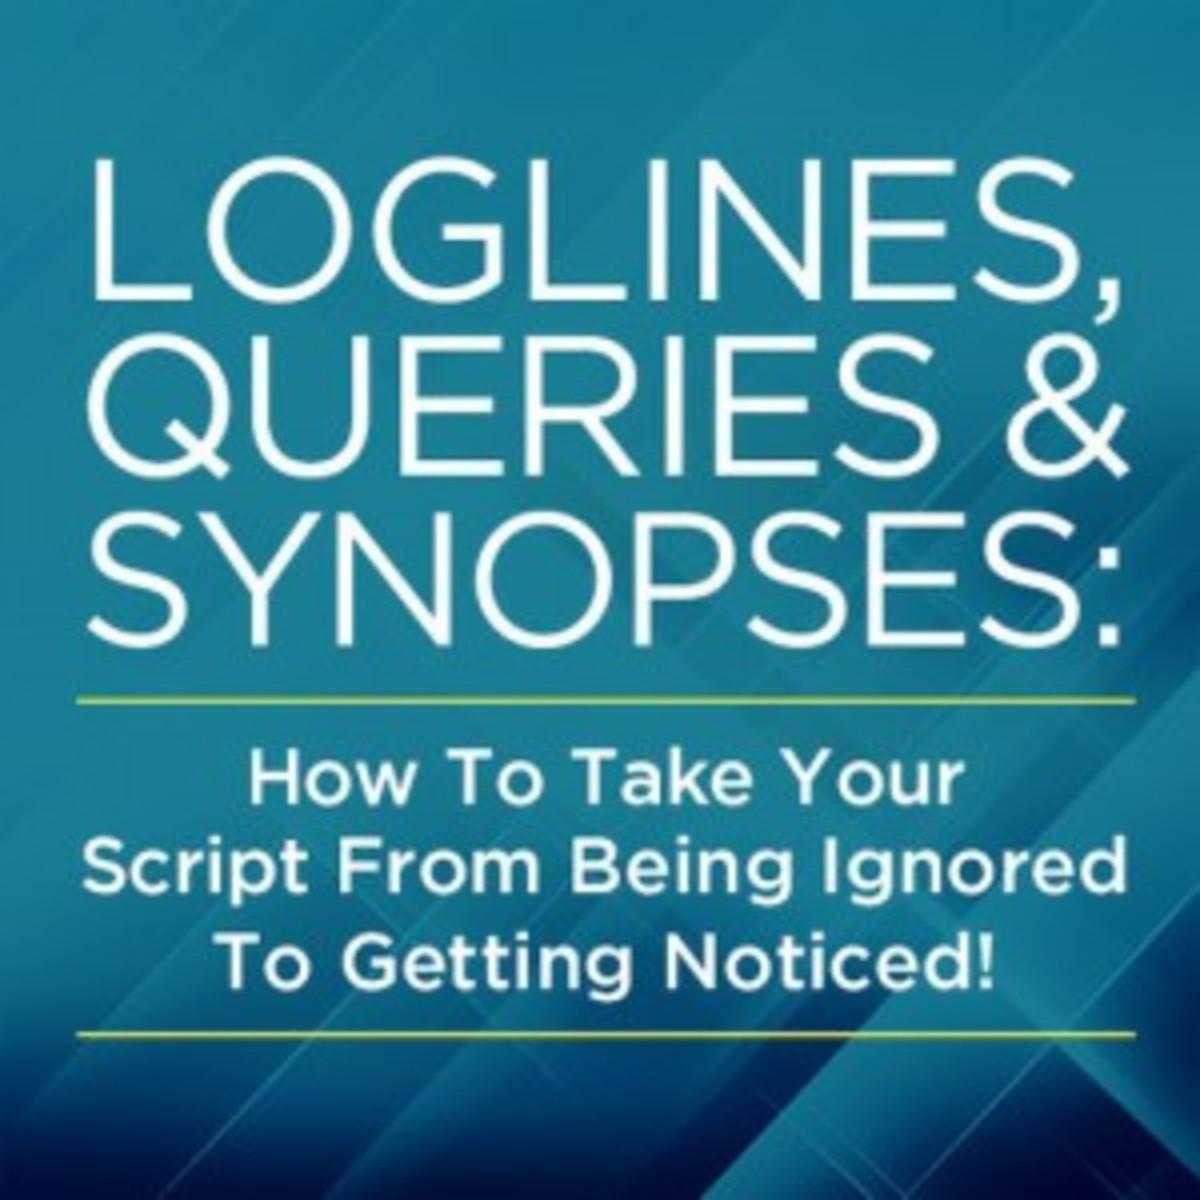 ws_loglinesqueriessynopses-500_medium